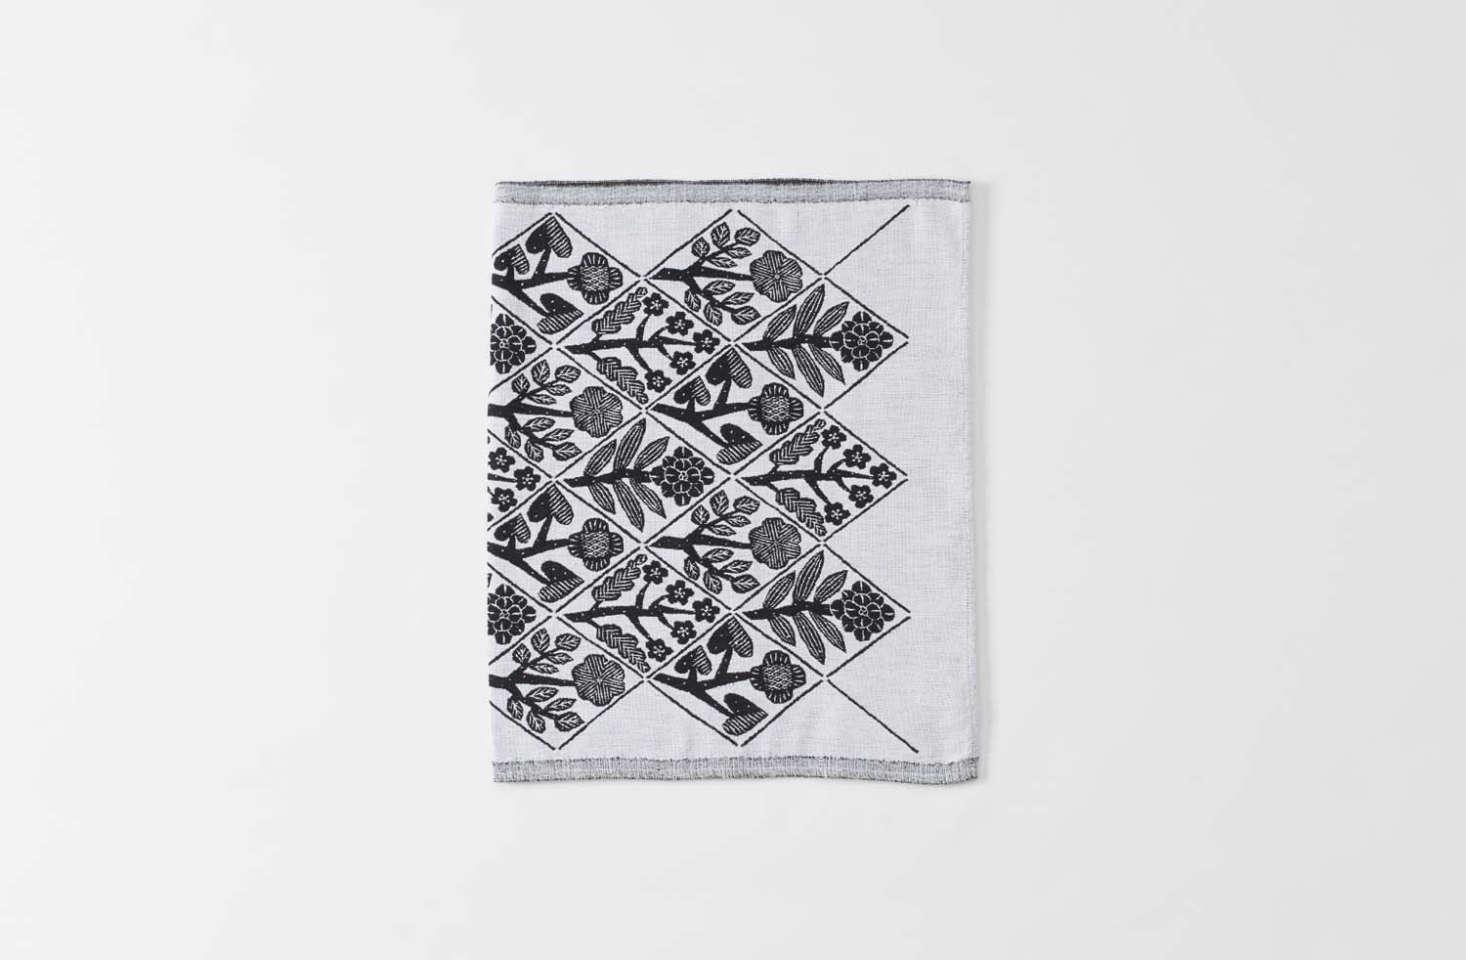 Flower, Stem, Leaf: Whimsical Tablecloths by a Japanese Artist